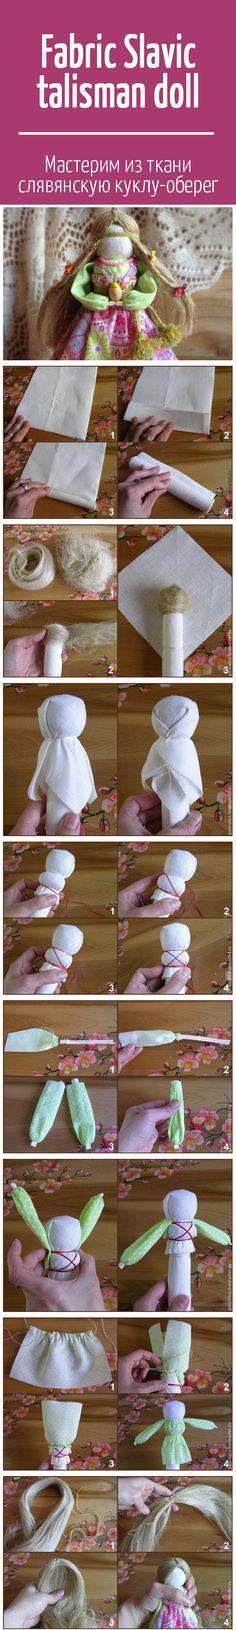 Fabric Slavic talisman doll / Мастерим из ткани слявянскую куклу-оберег